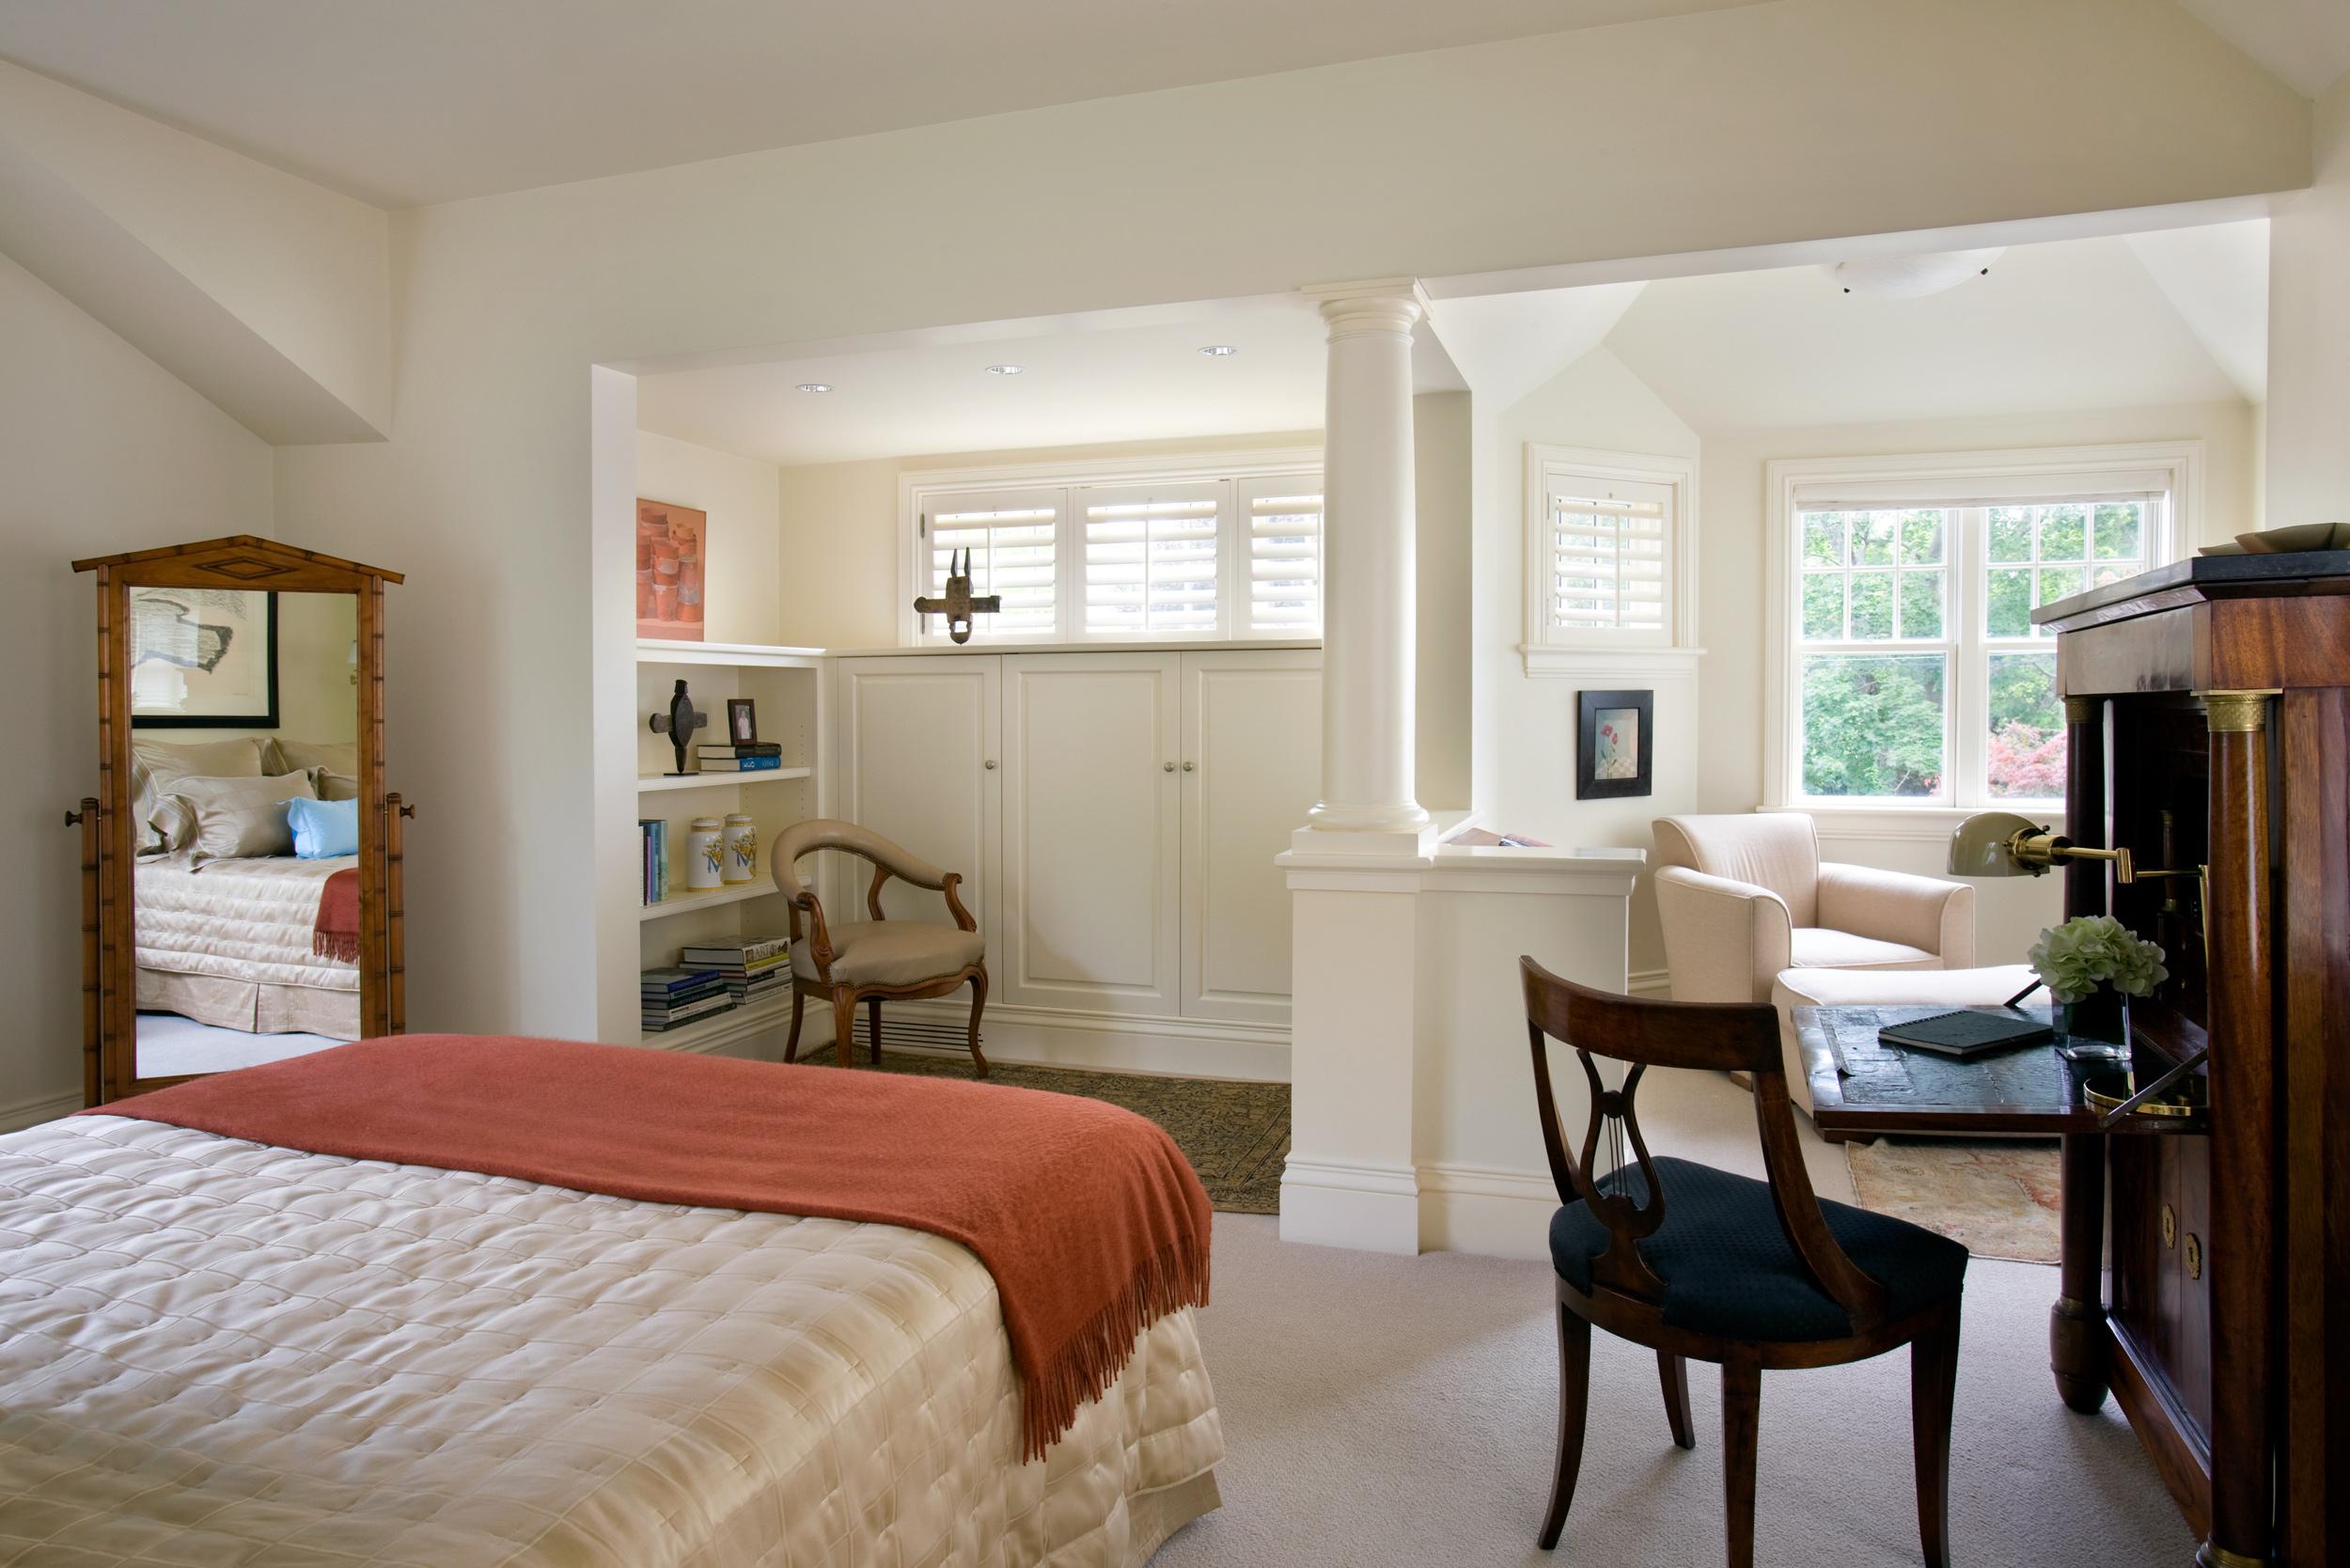 Cape_Cod_Doreve_bedroom.jpg